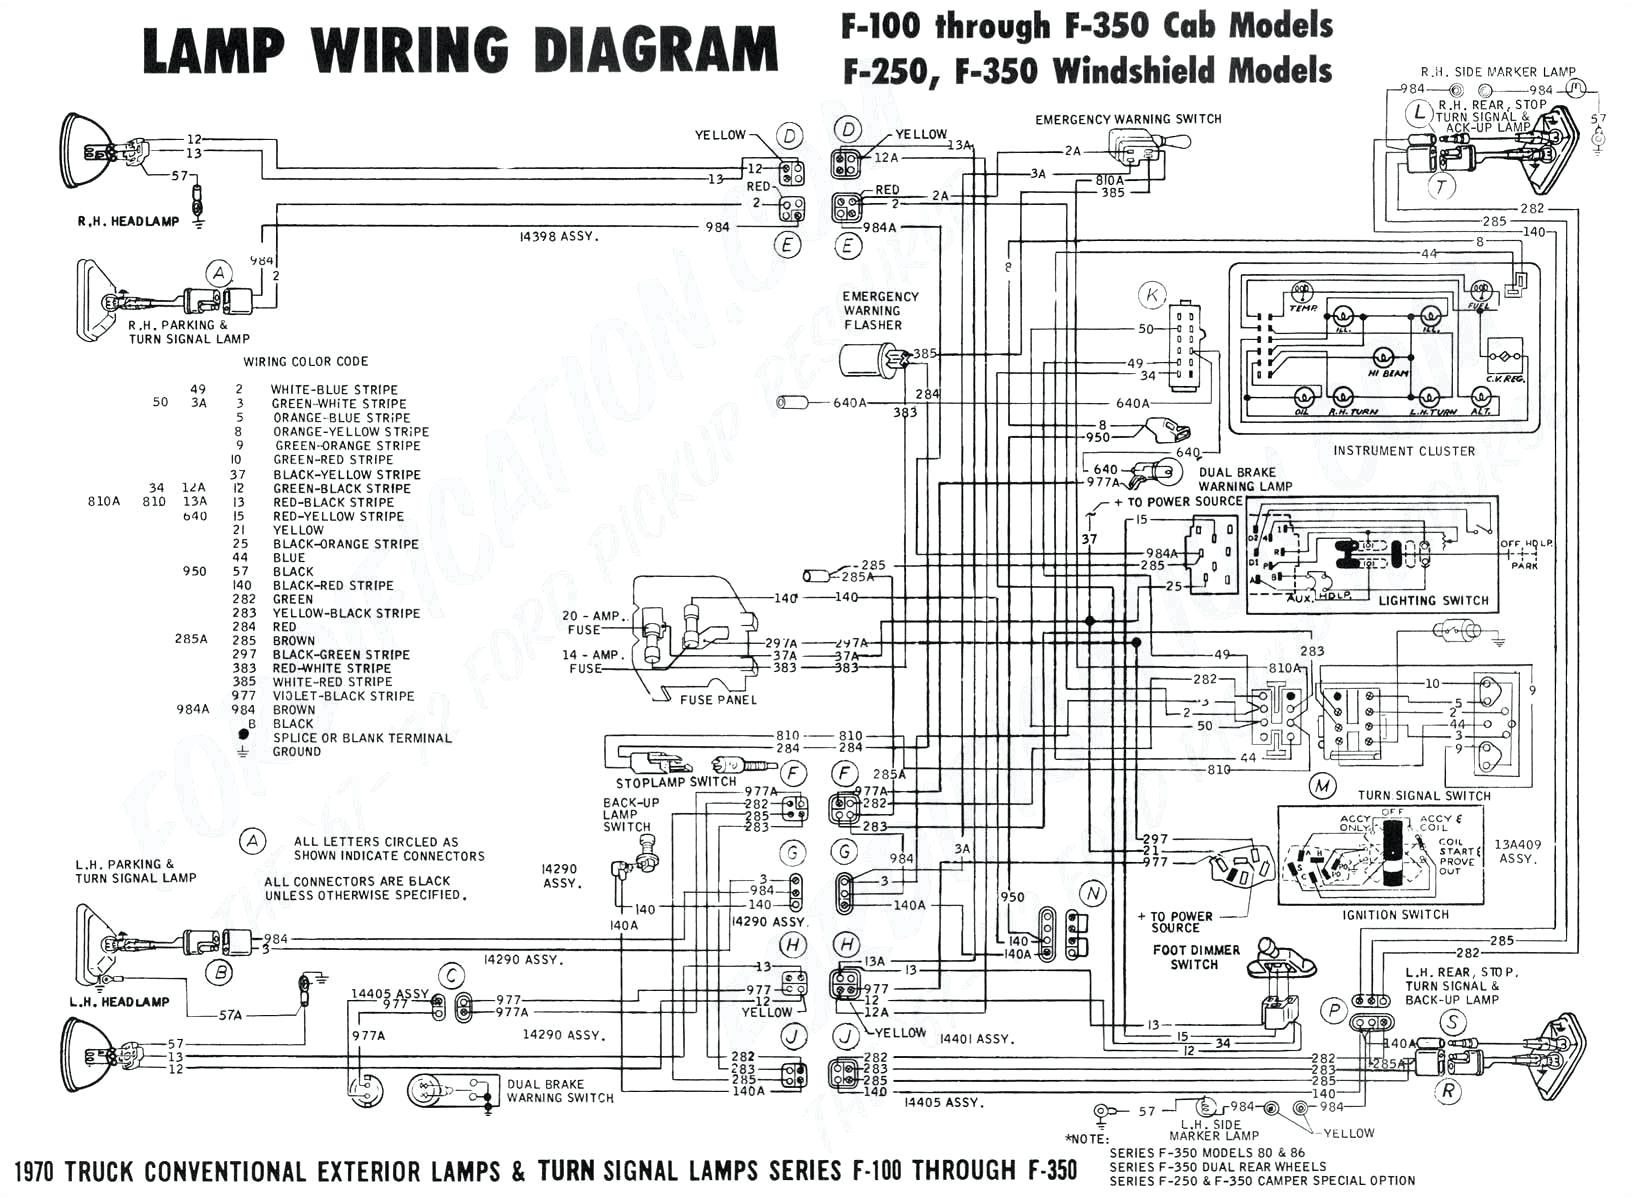 2006 Dodge Ram Headlight Switch Wiring Diagram 1983 Dodge Ram Wiring Diagram Diagram Base Website Wiring